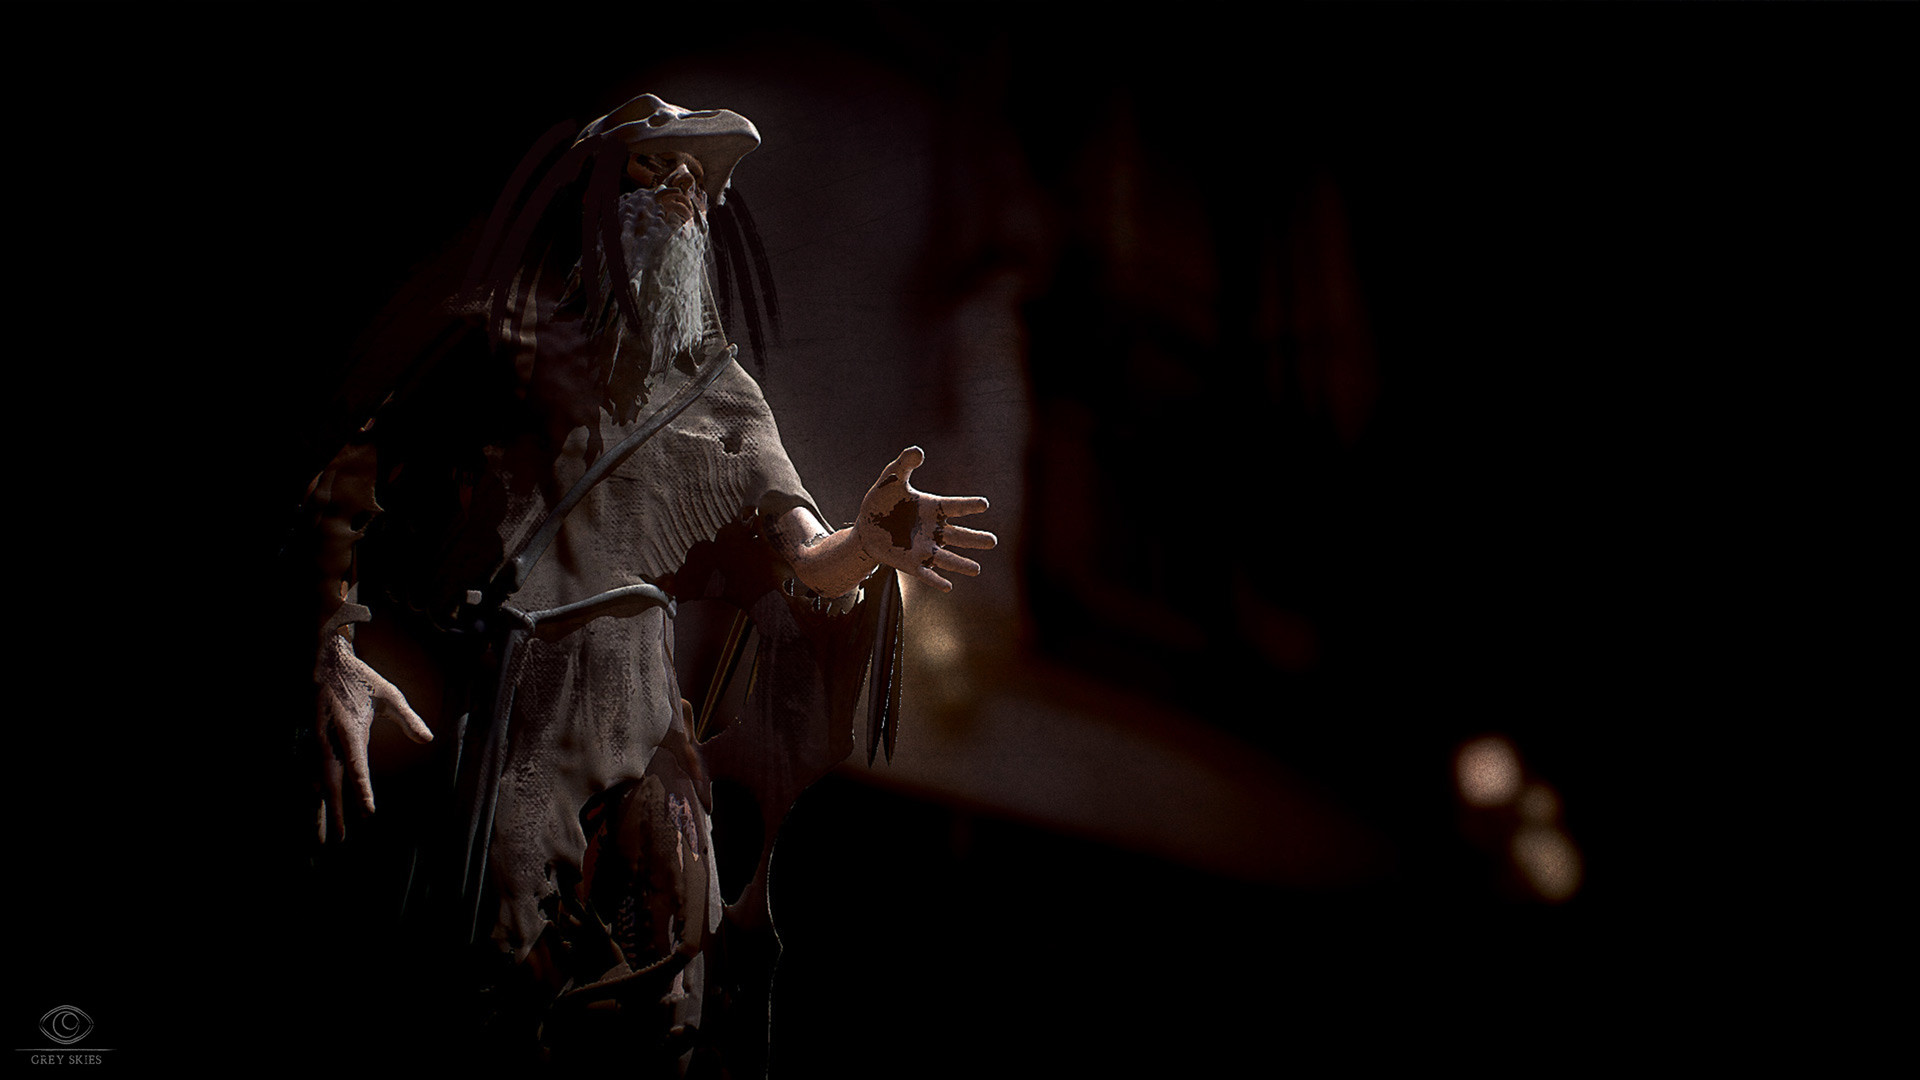 Wojtek kapusta ravensshadow2